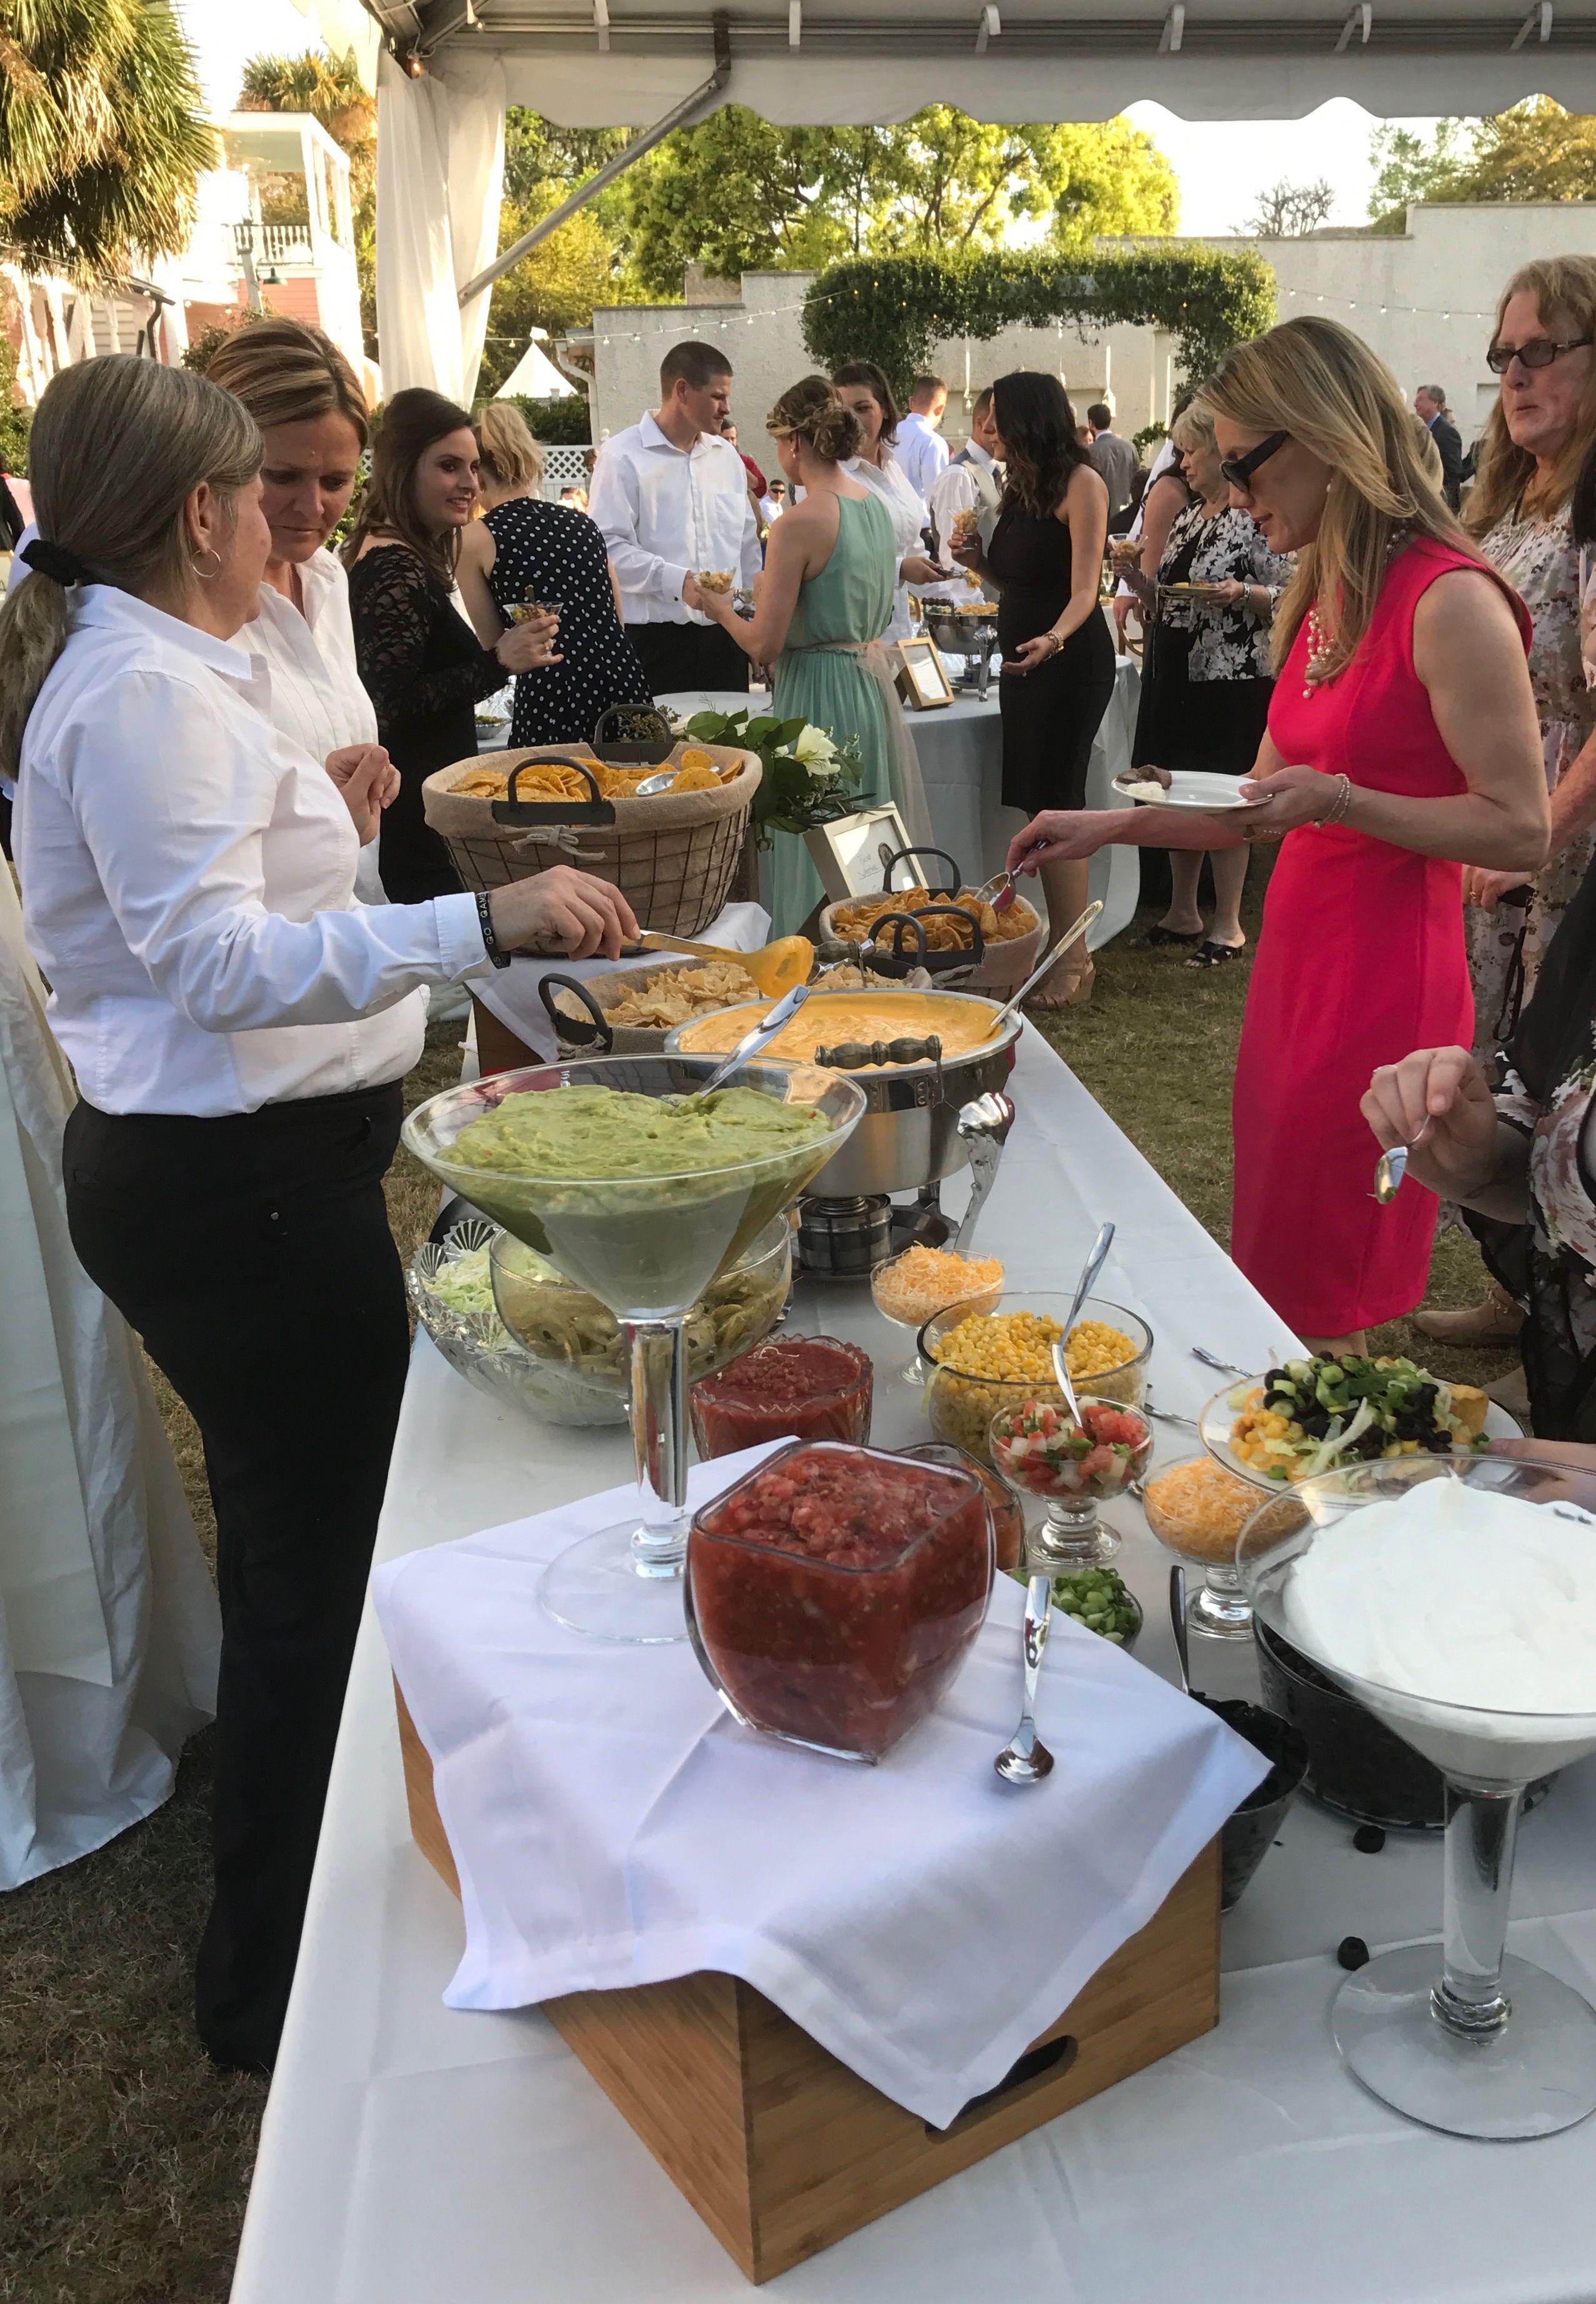 Nacho Bar Catering By Debbi Covington Beaufort Sc Bar Catering Nacho Bar Wedding Food Bars